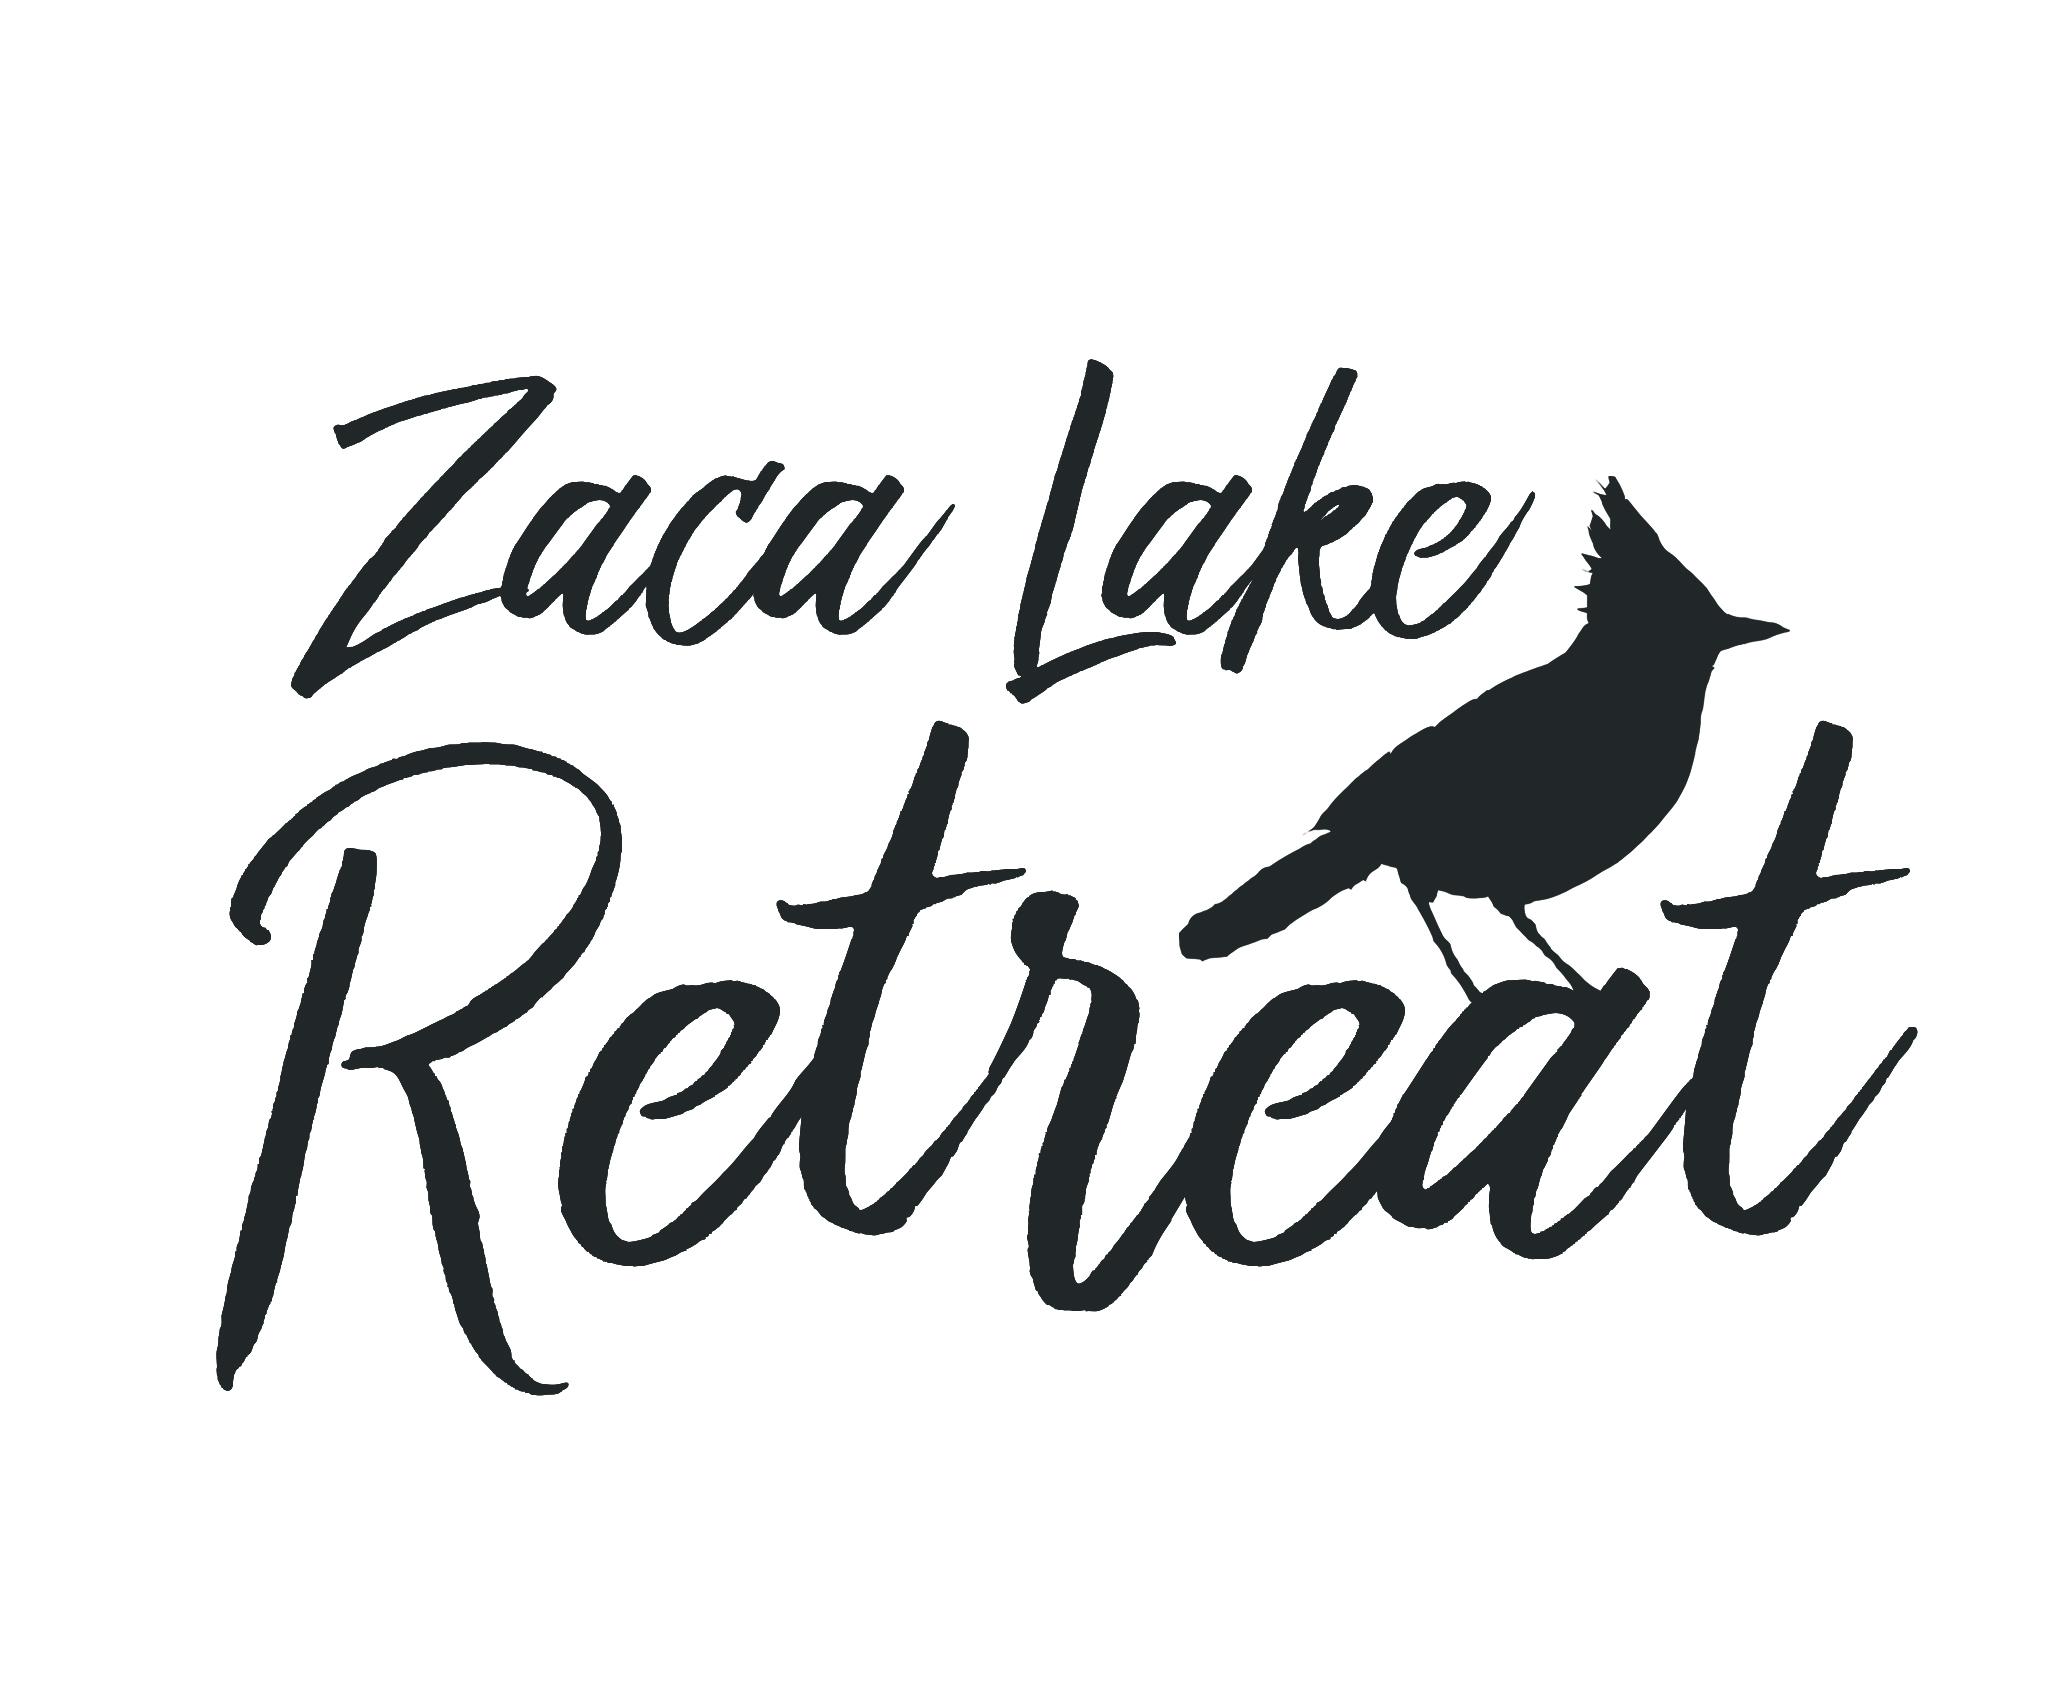 Zaca Lake Retreat Identity Design